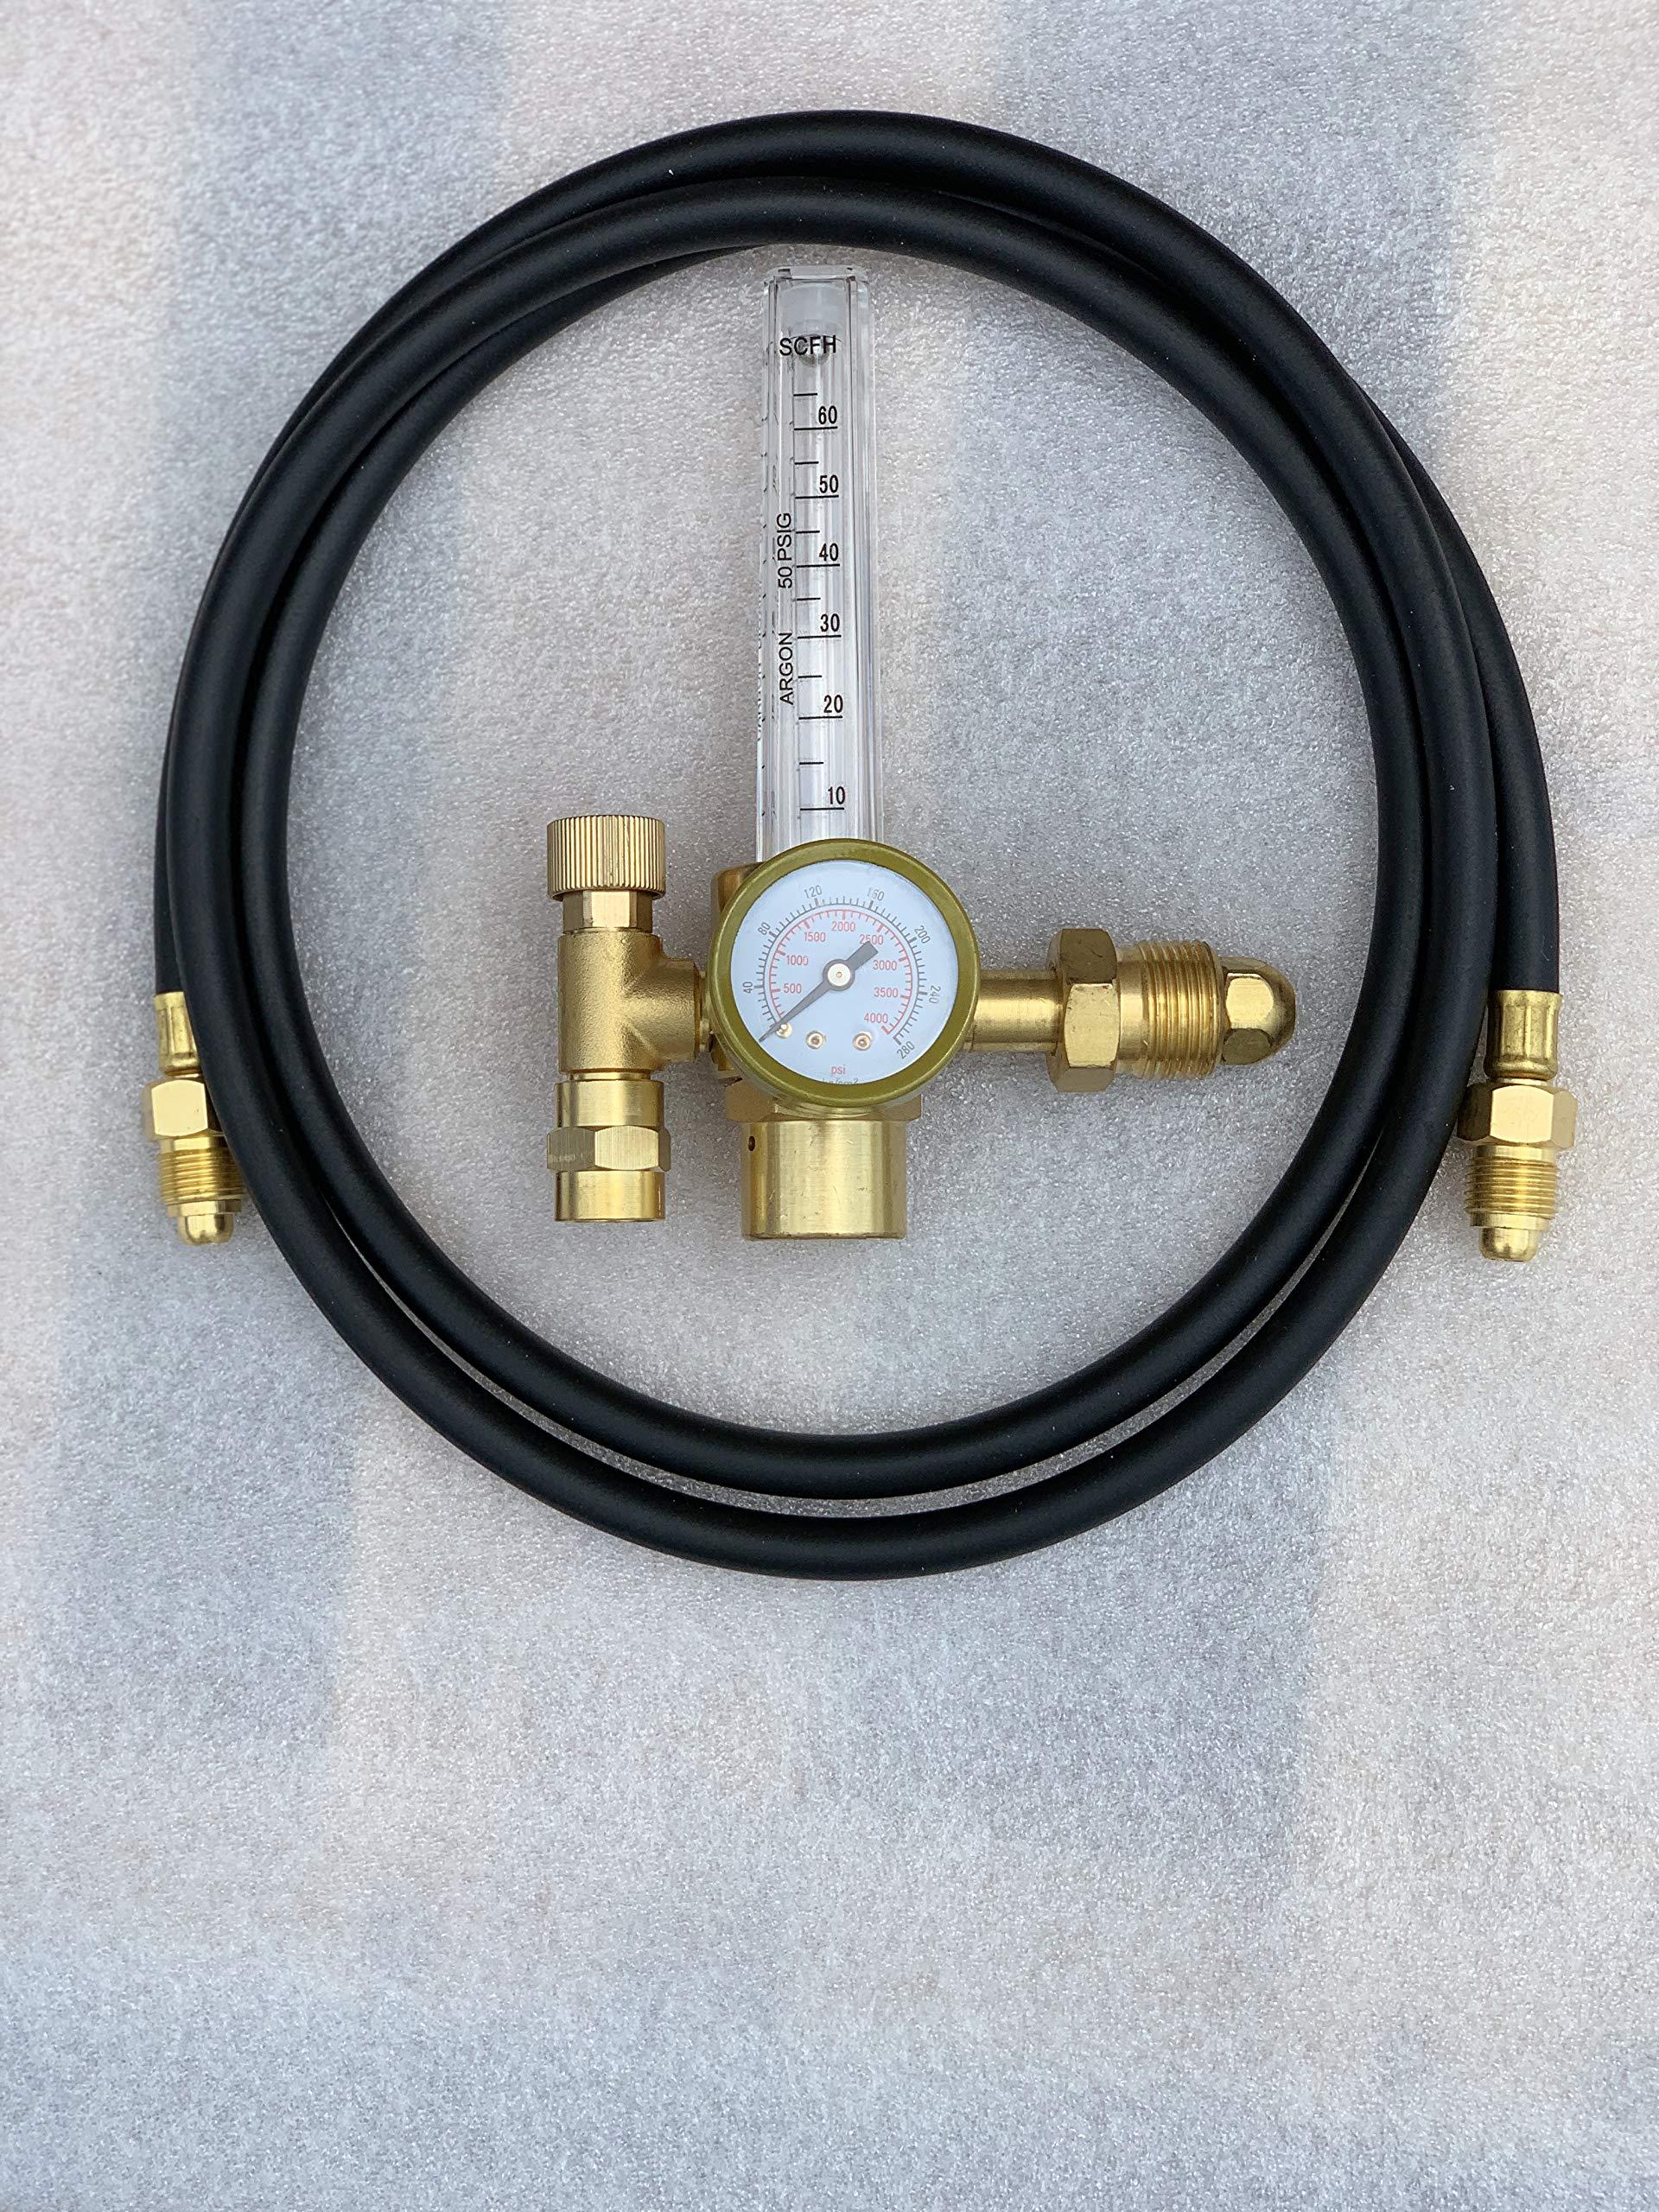 Argon Regulator TIG Welder MIG Welding CO2 Flowmeter 10 to 60 CFH - 0 to 4000 psi pressure gauge CGA580 inlet Connection Gas Welder Welding Regulator More Accurate Gas Metering For Gas Delivery System by Masterweld